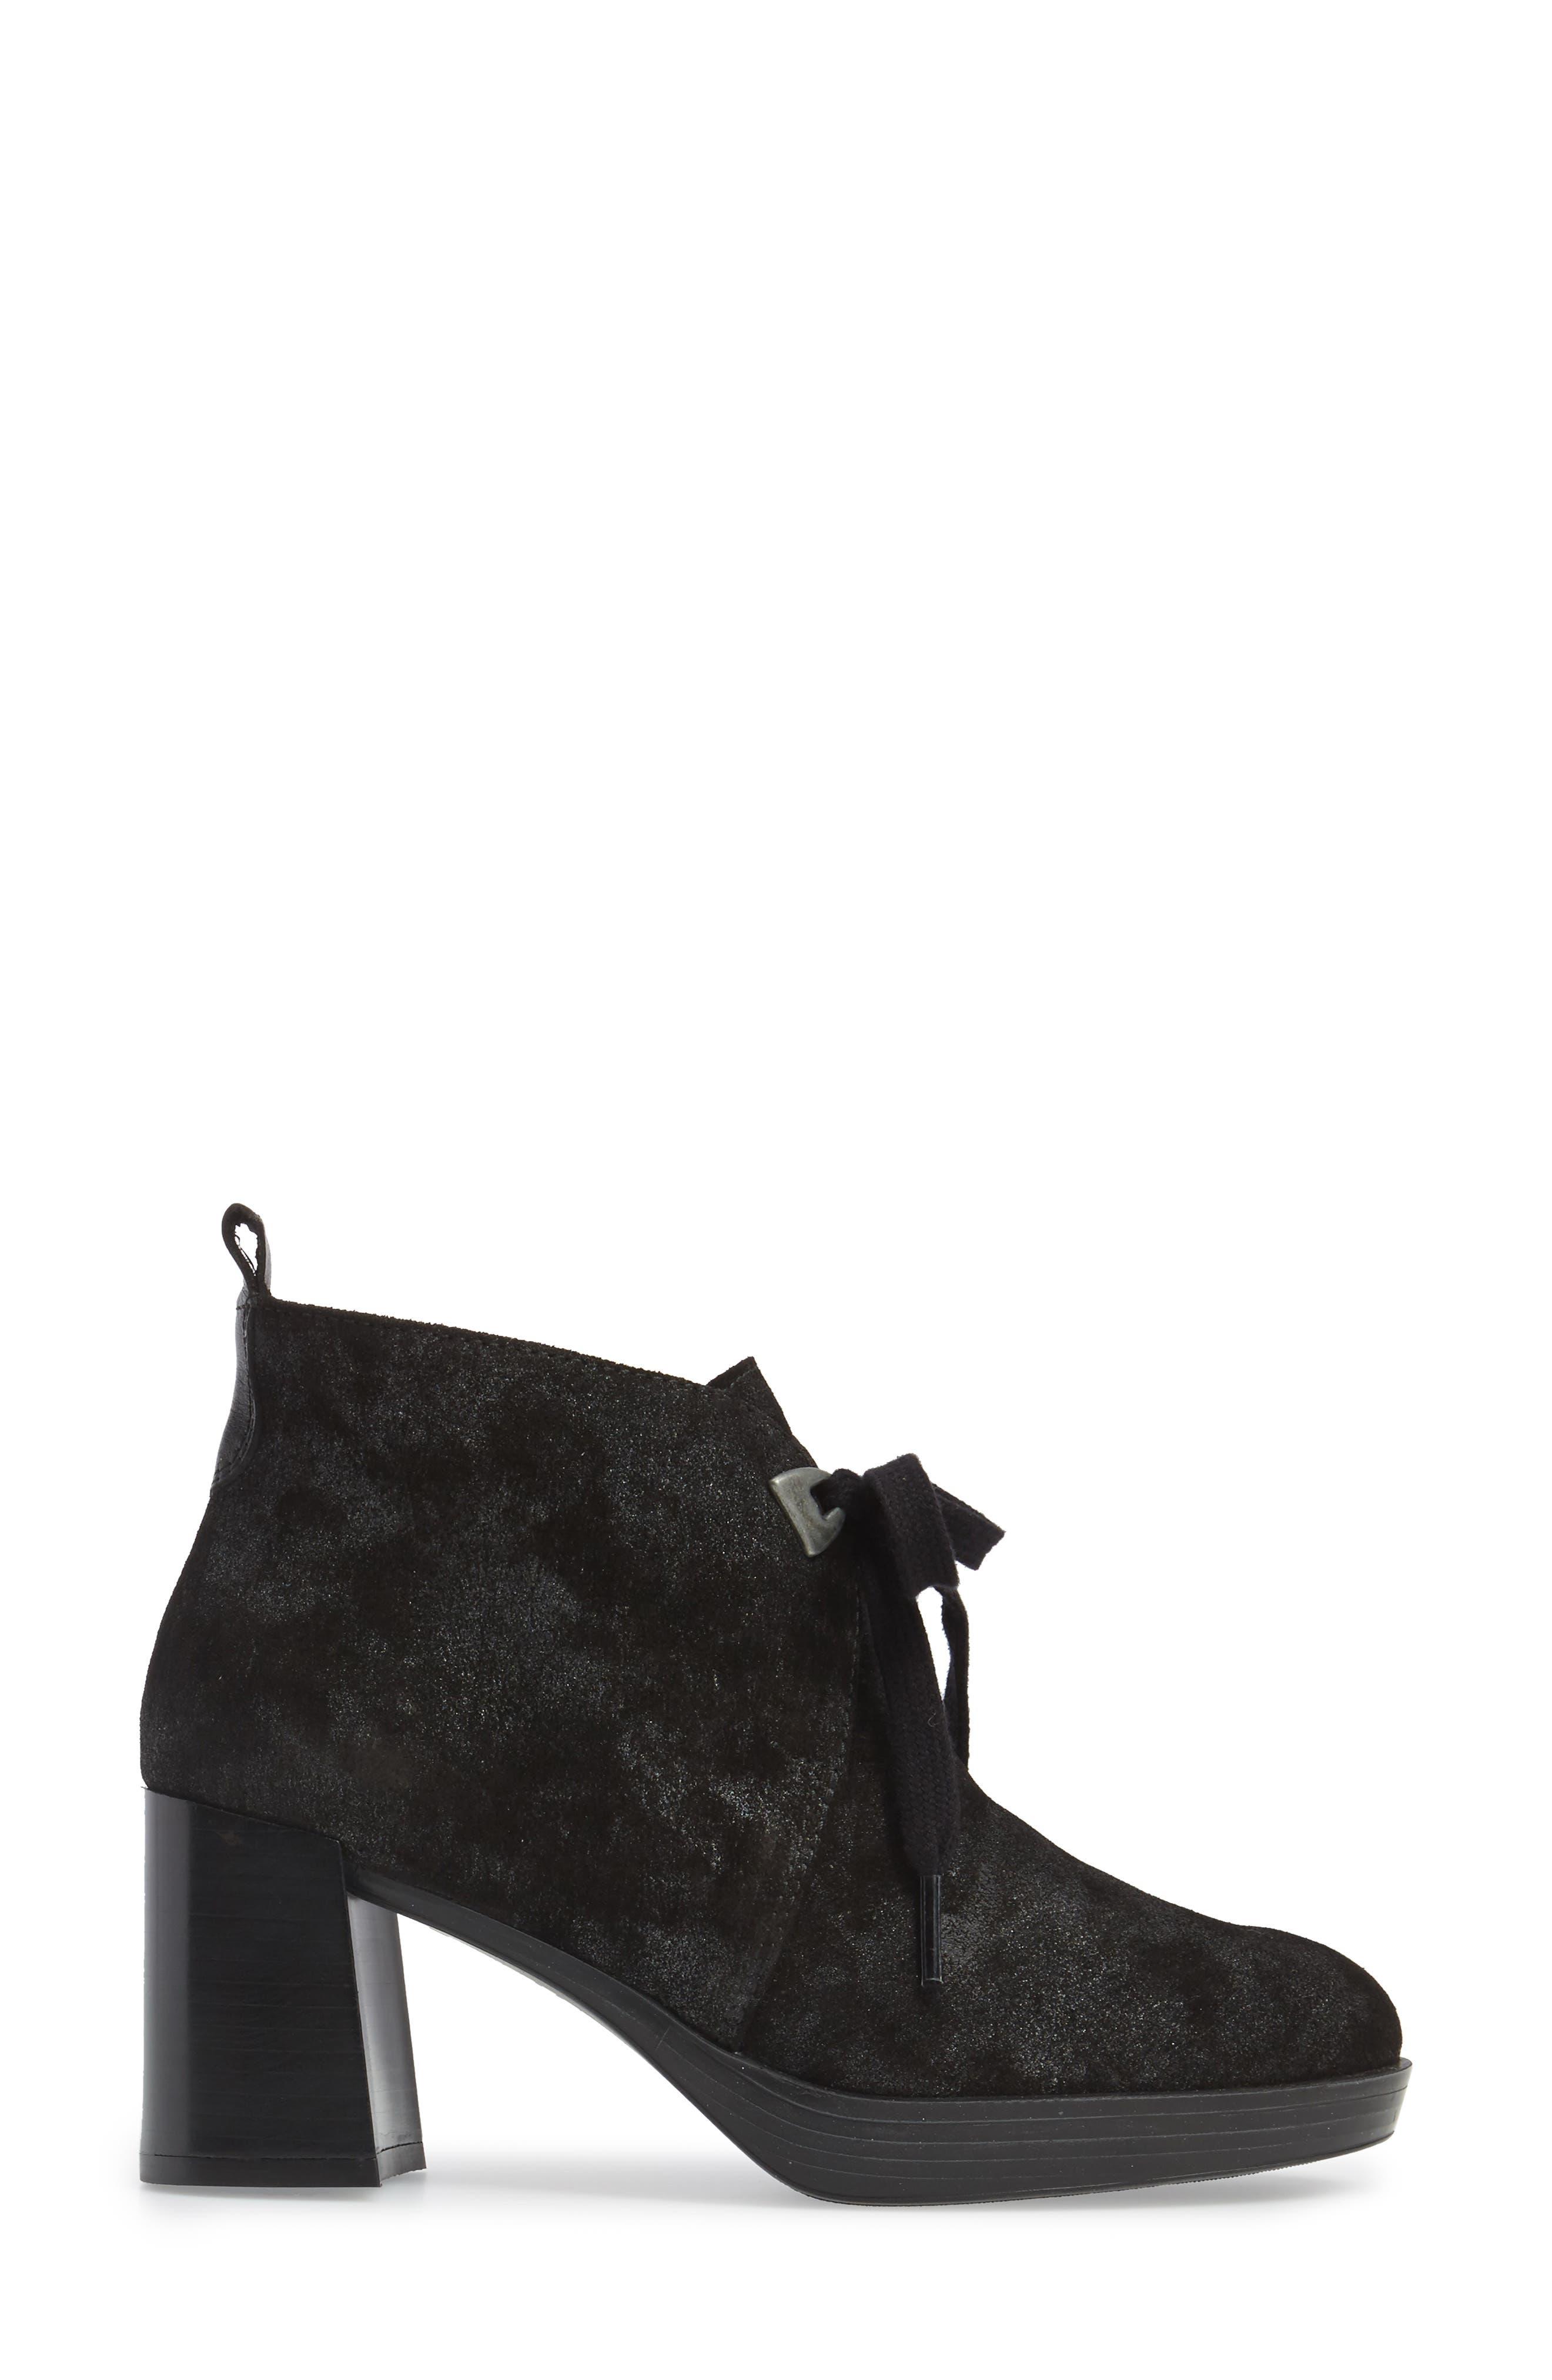 Dasia Bow Bootie,                             Alternate thumbnail 3, color,                             Brut Black Leather